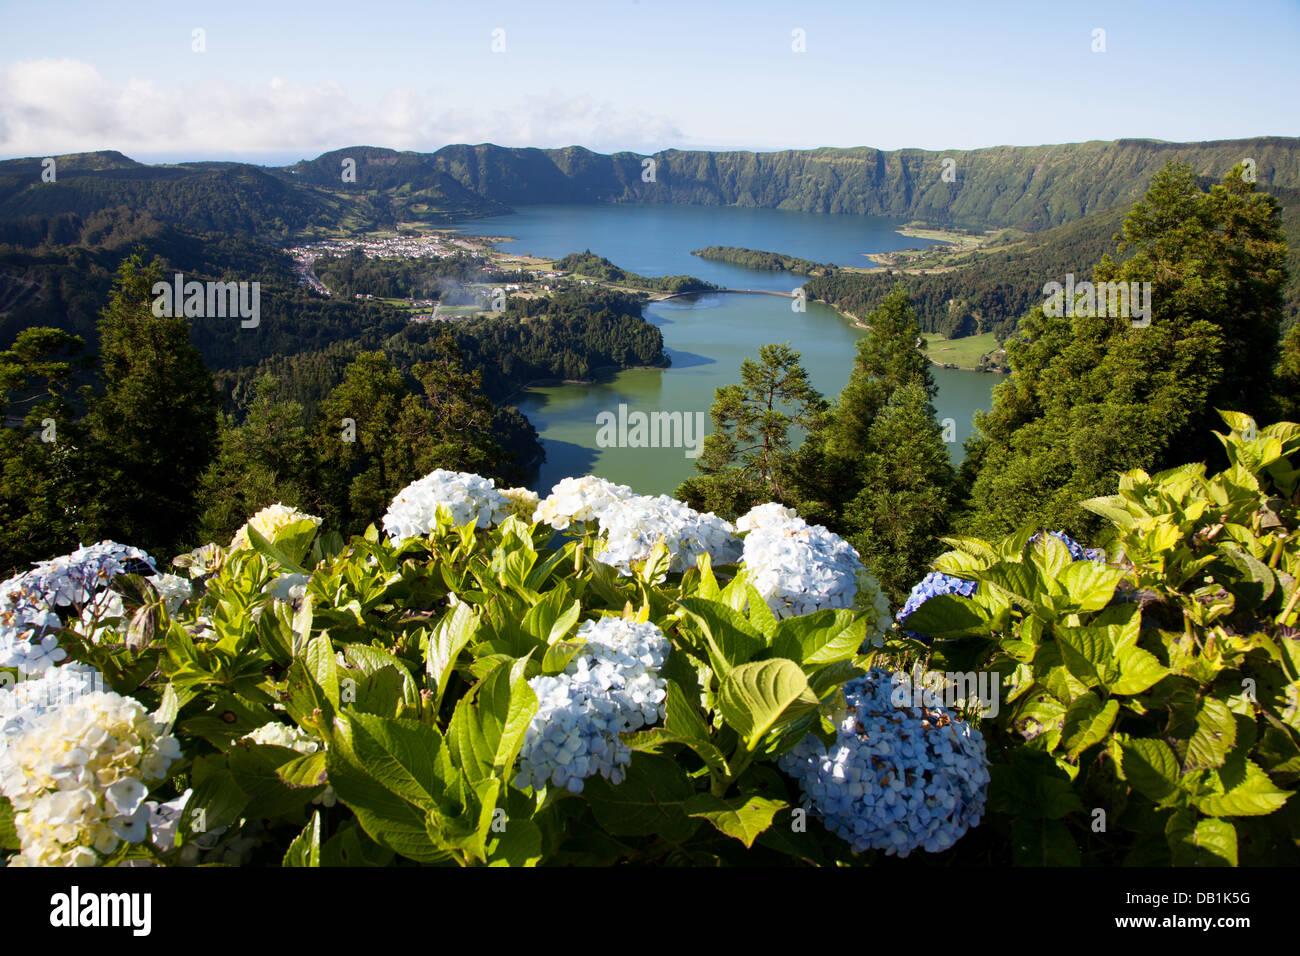 Sete Cidades , Miradouro da Vista do Rei , Ilha de S.Miguel - Açores - Stock Image